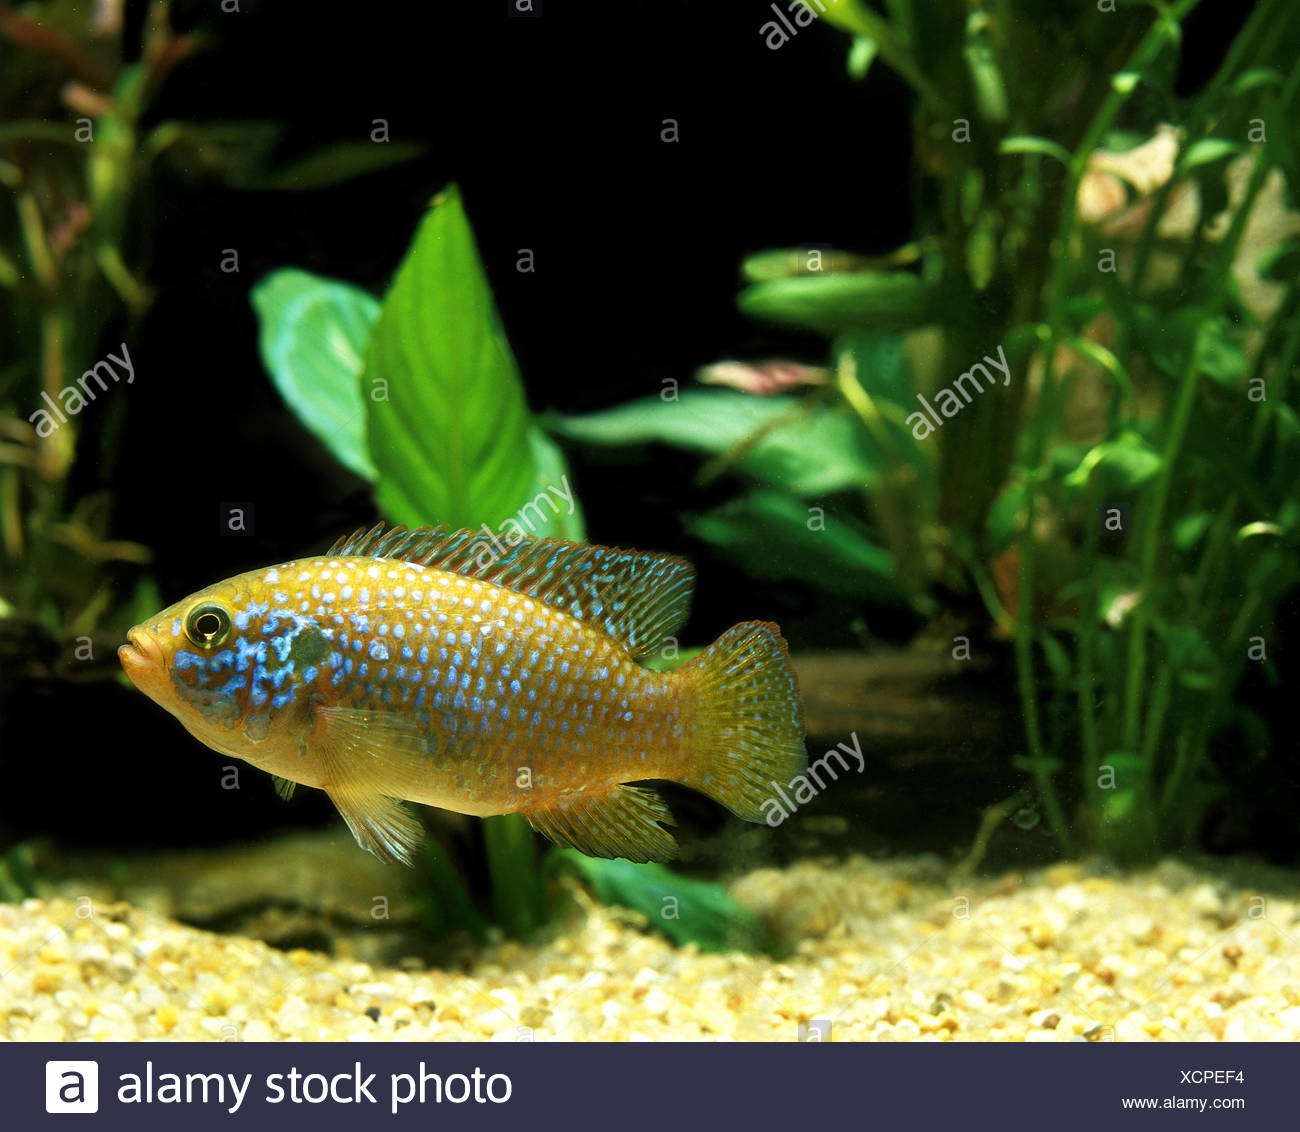 African Fish, hemichromis lifalili, Cichlid, Adult Stock Photo ...